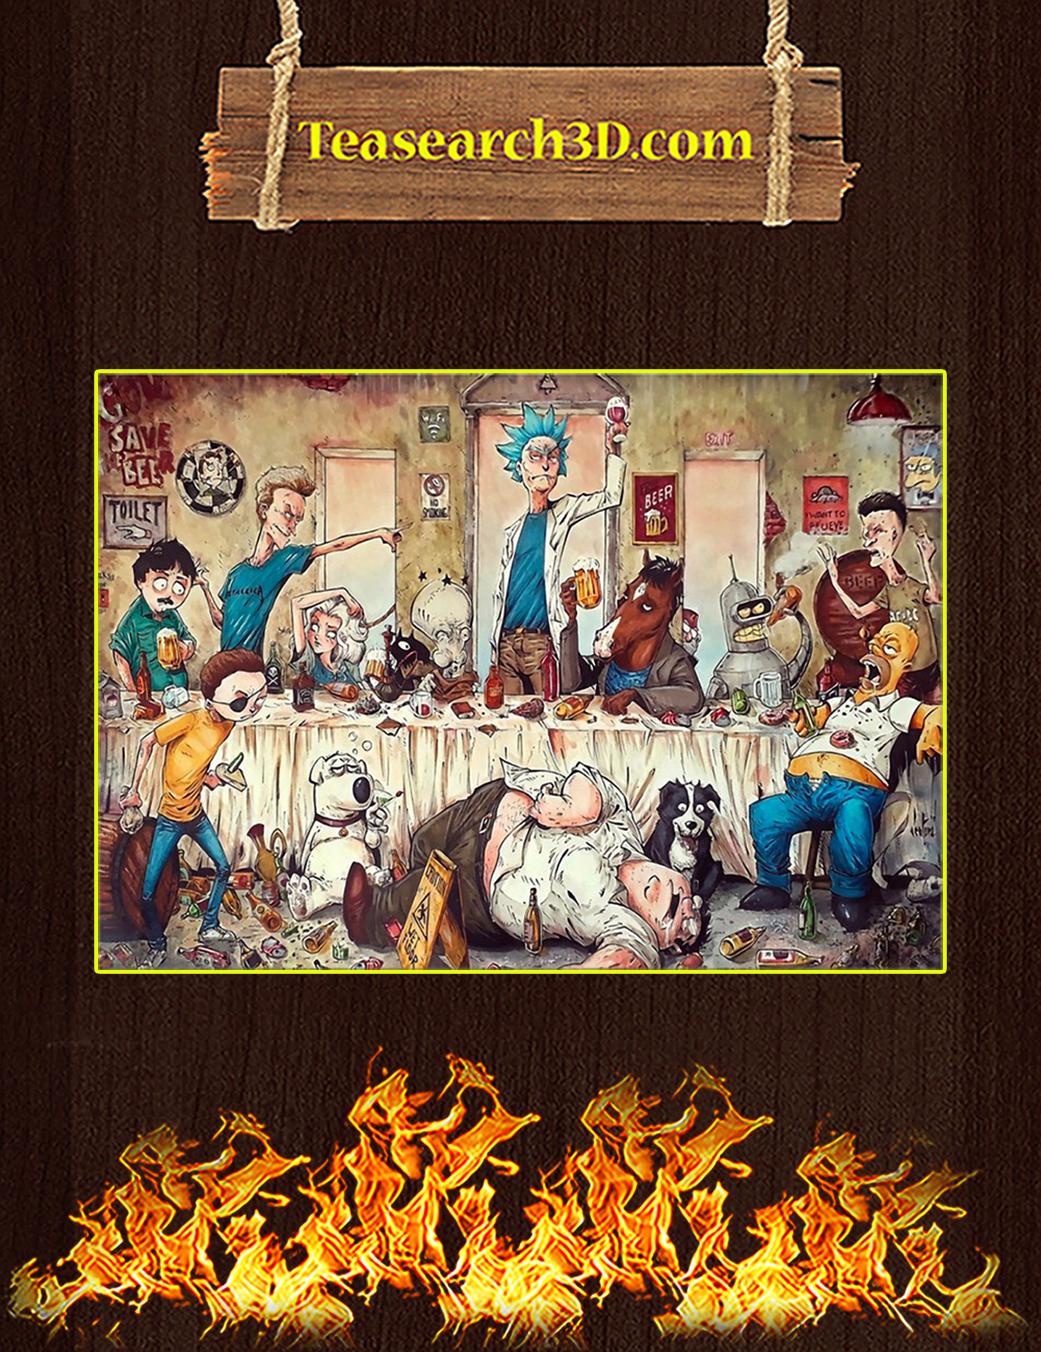 Adult cartoons art work by marcelo ventura poster A1